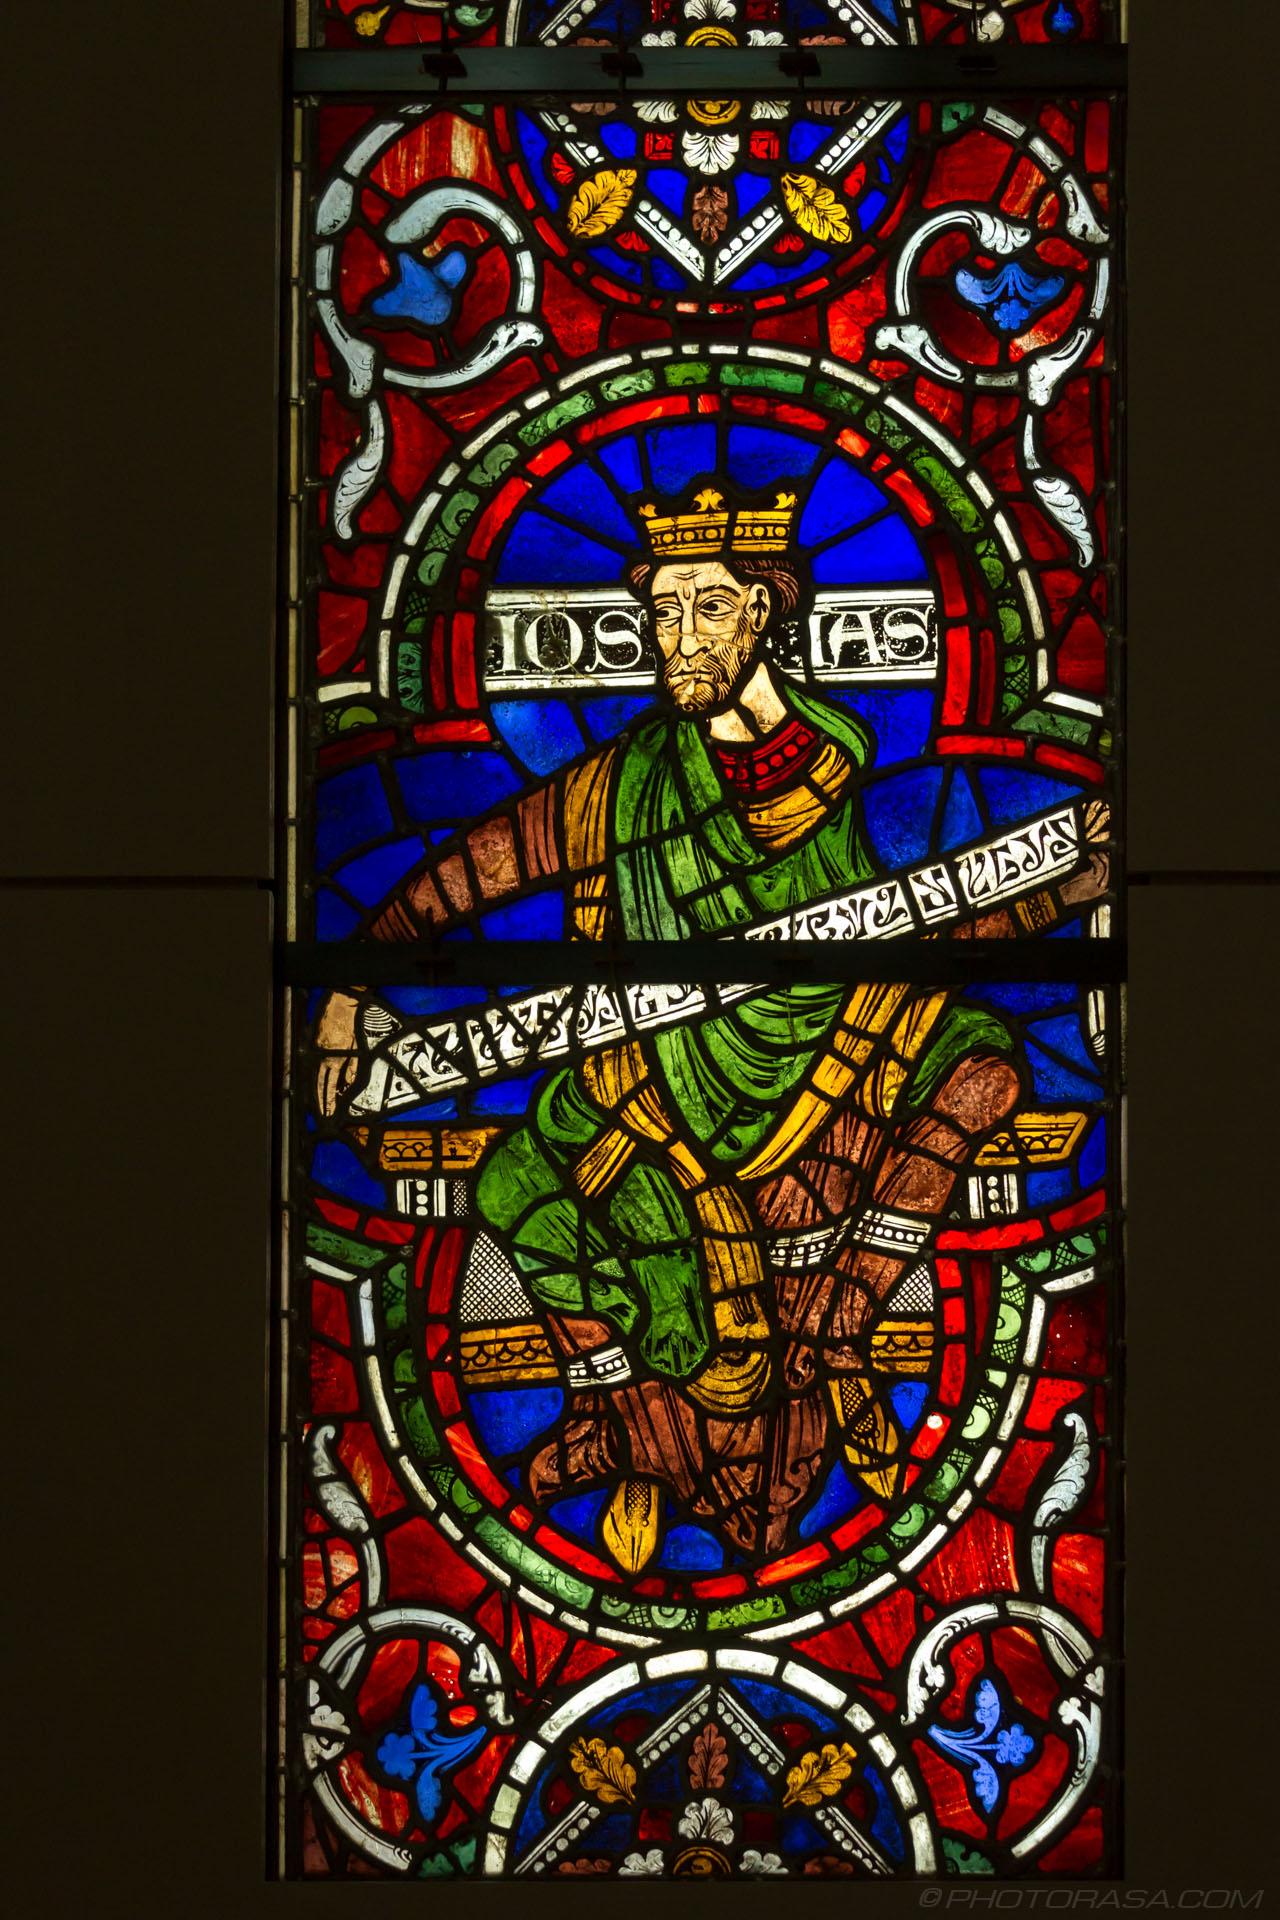 https://photorasa.com/genealogical-stained-glass-the-ancestors-of-jesus/josias-josiah-stained-glass/